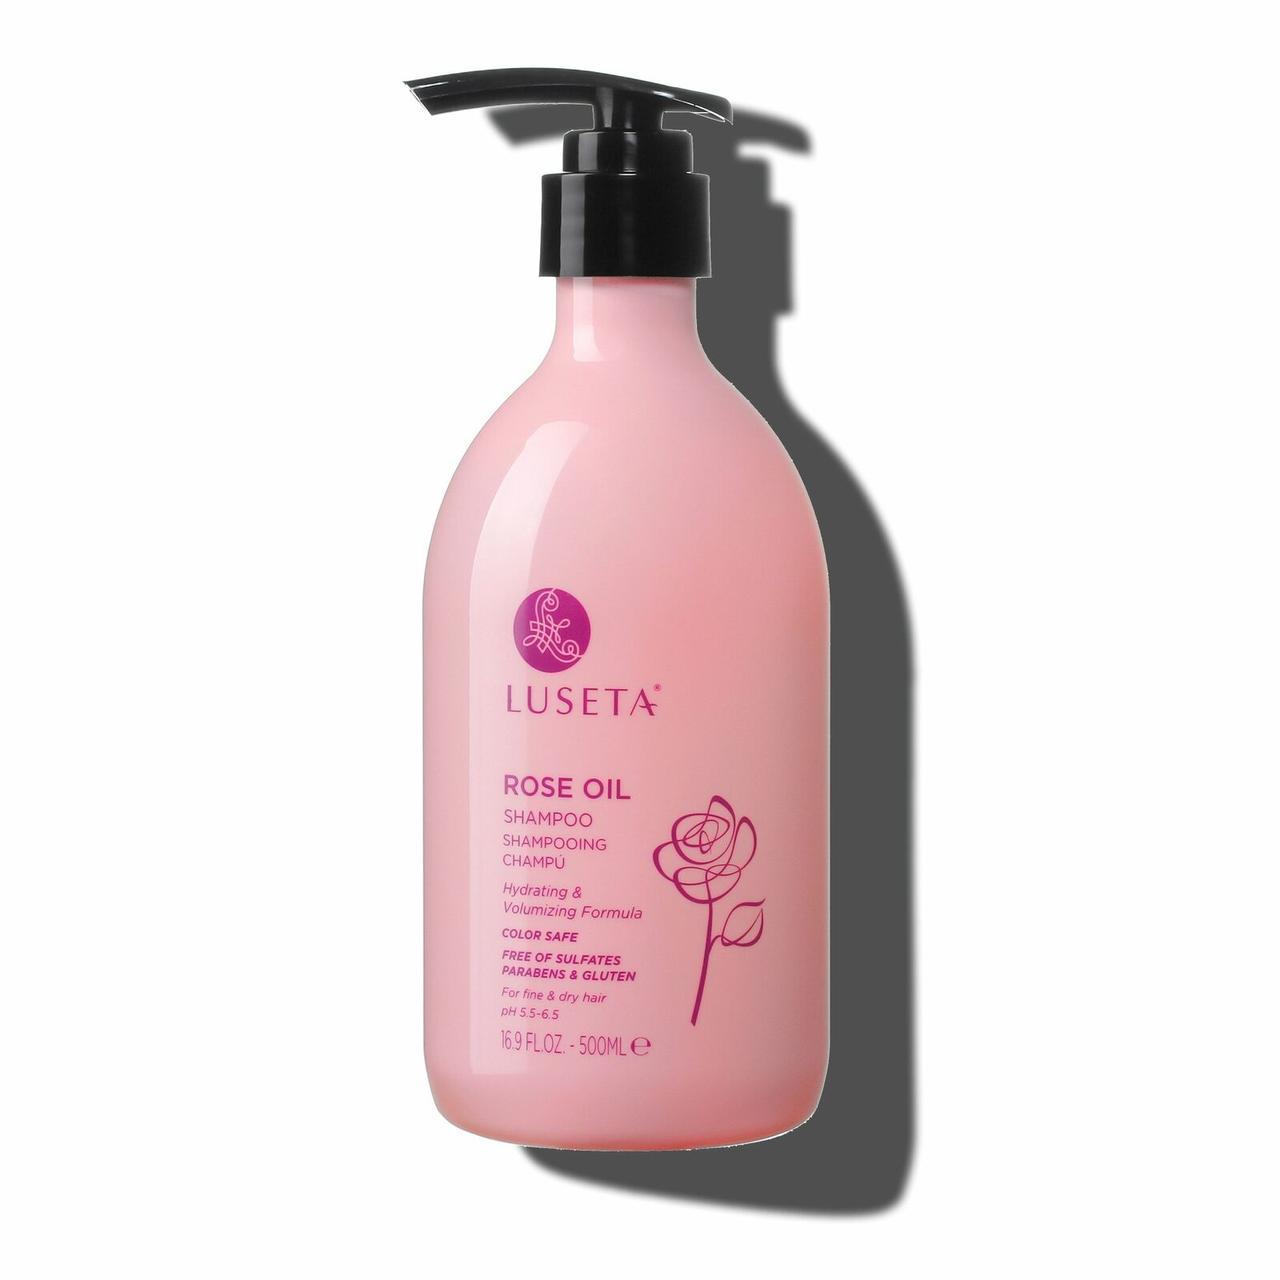 Шампунь для об'єму волосся Luseta Rose Oil Shampoo 500ml